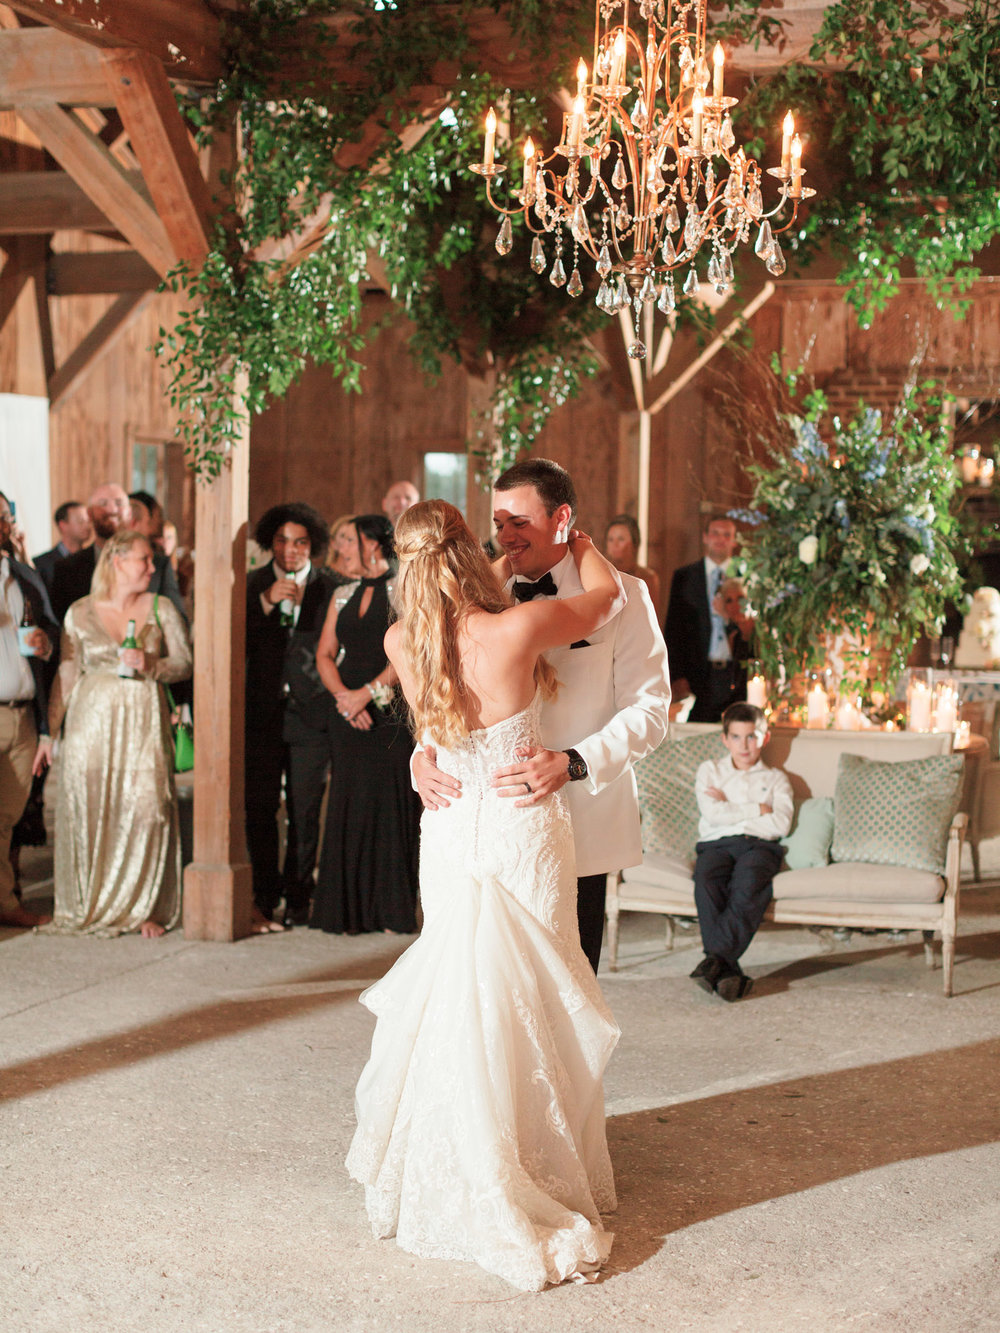 Boone-Hall-Wedding-Photographer-119.jpg